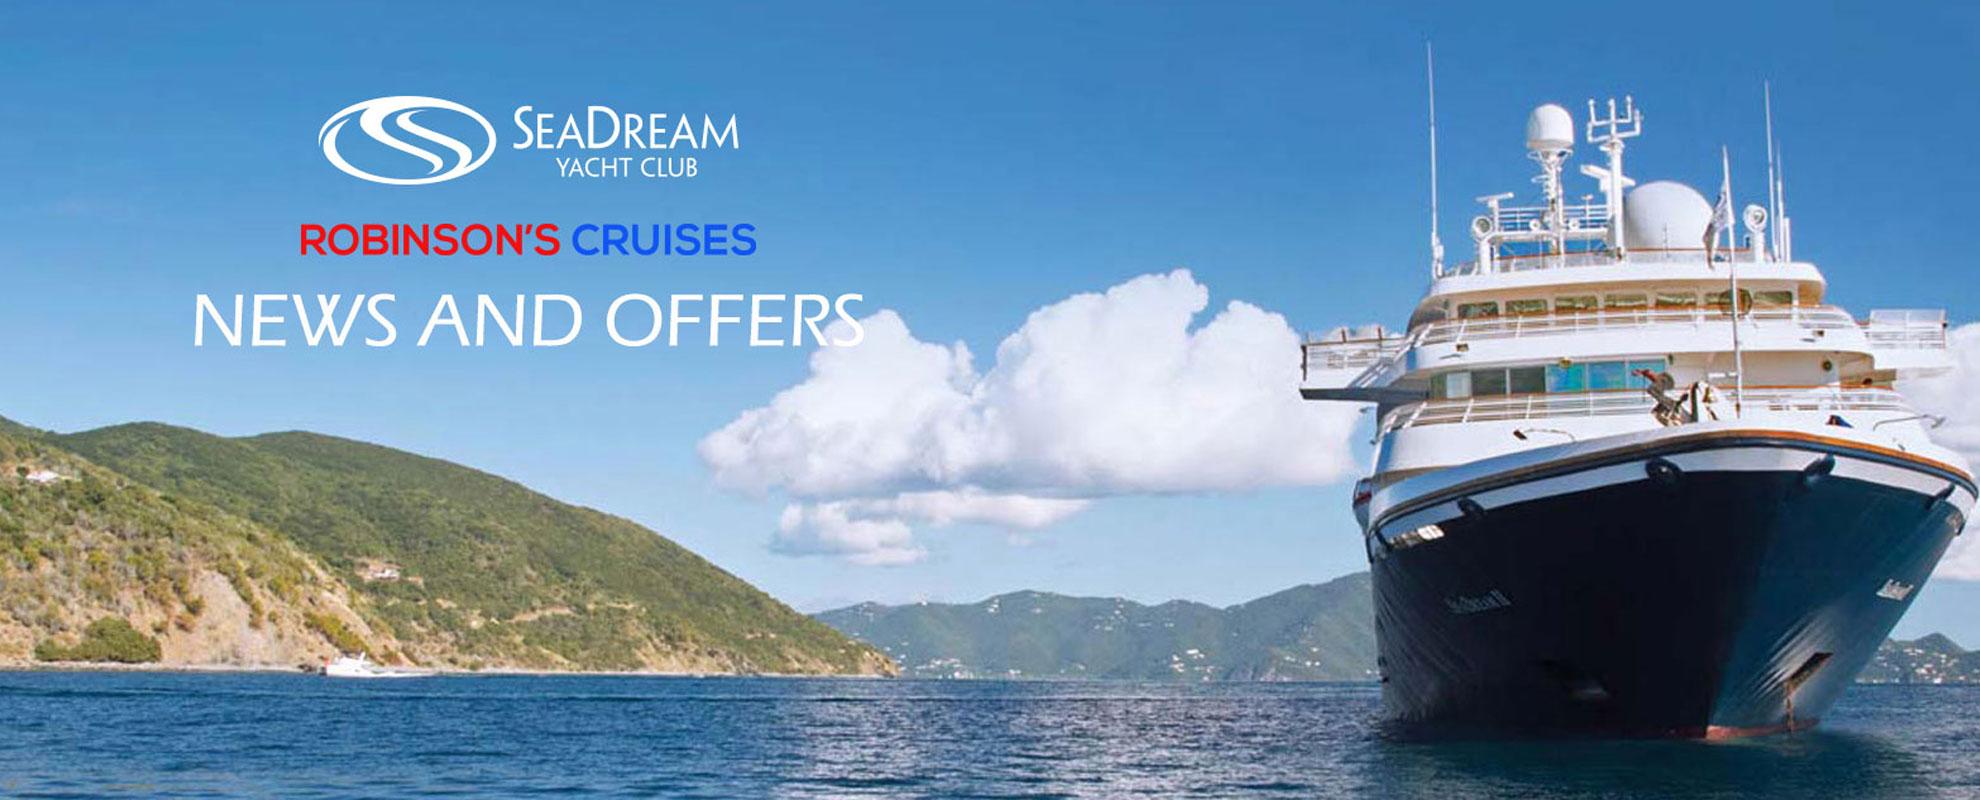 Seadream News and Offers bg